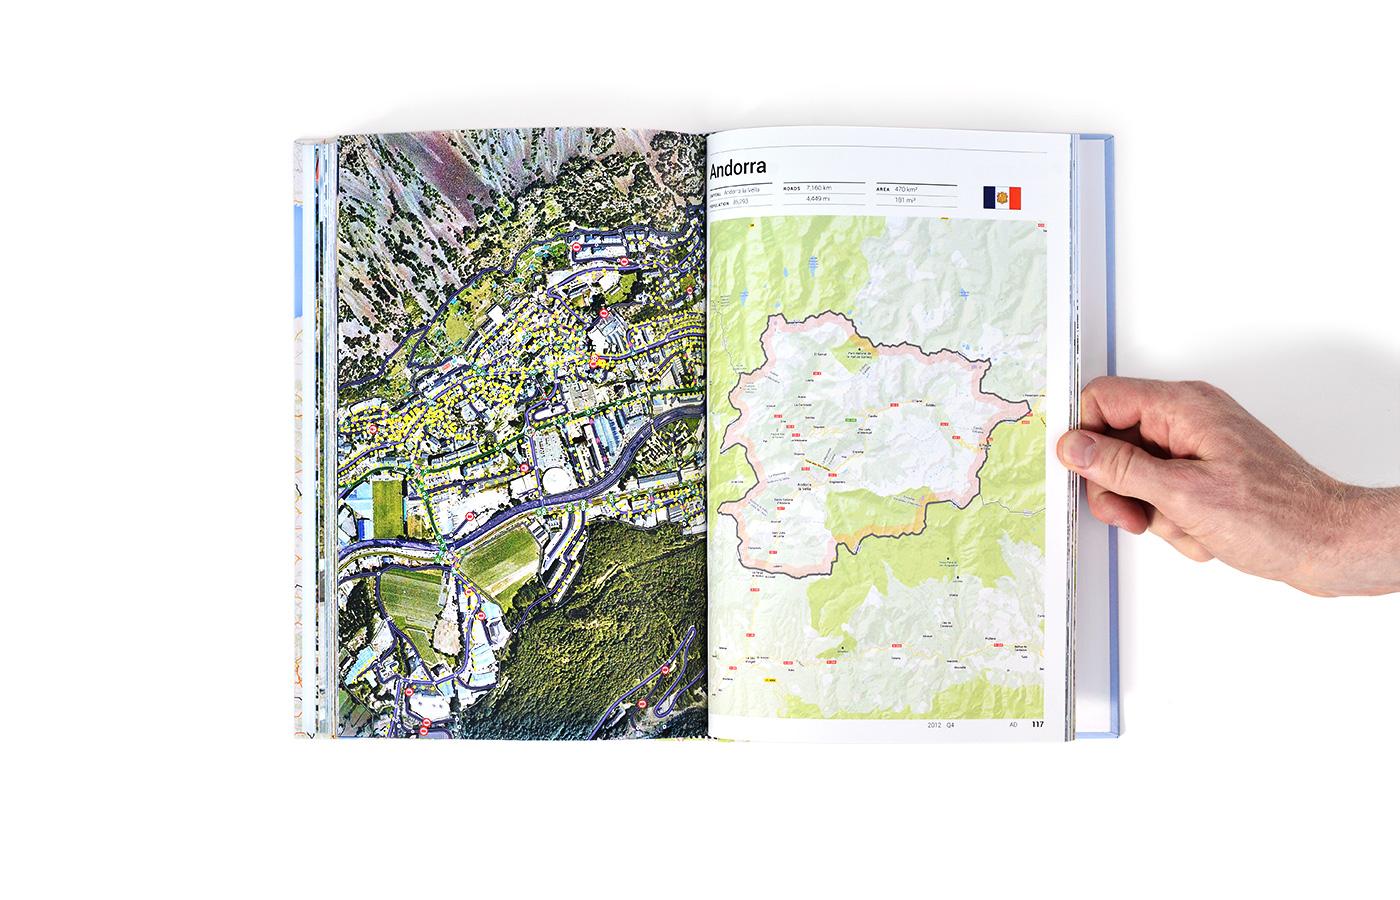 http://carlbeanlarson.com/files/gimgs/32_google-maps-atlas-06-andorra.jpg